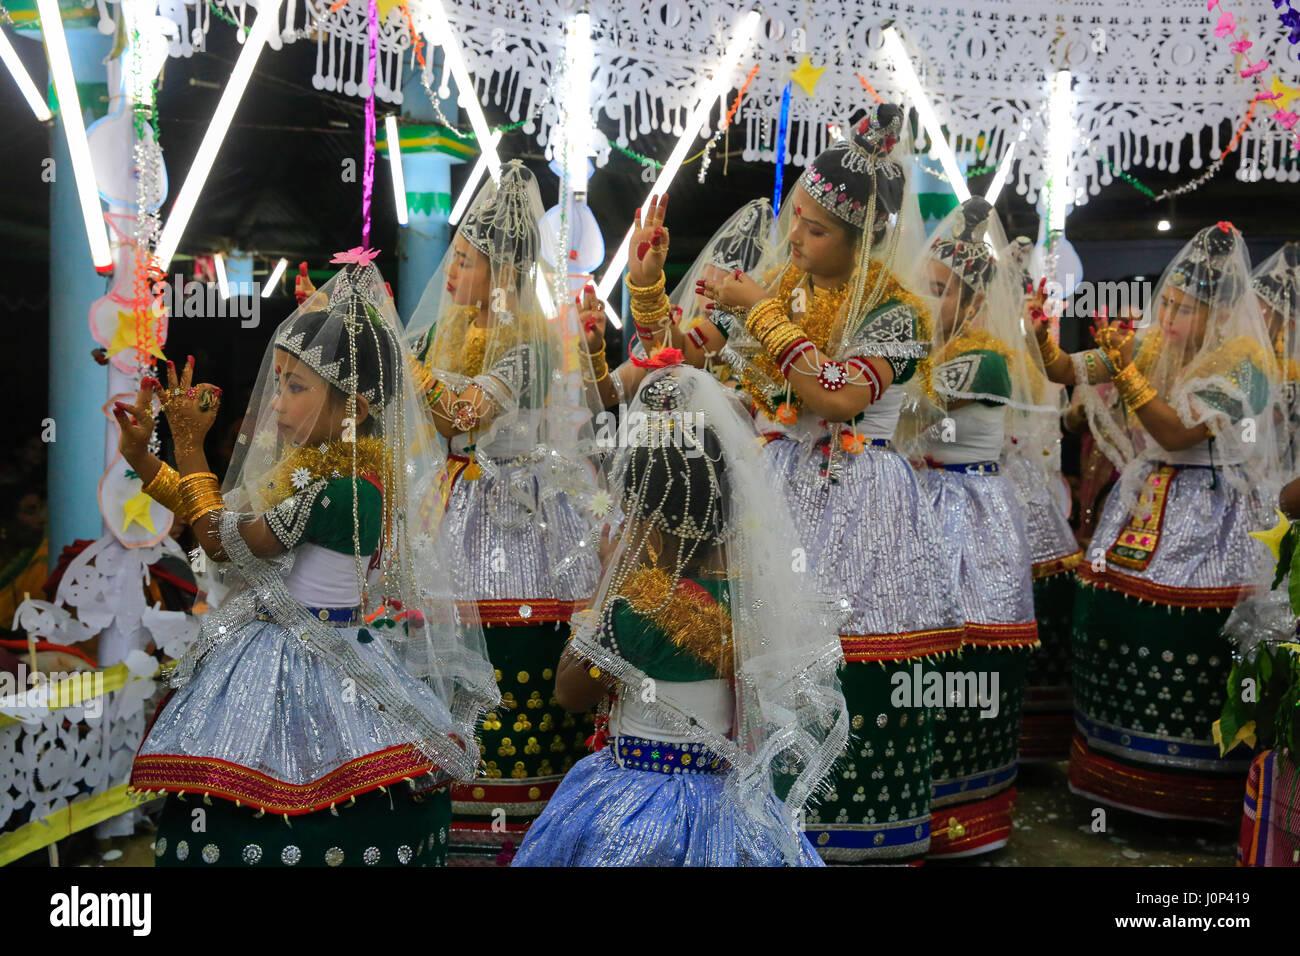 Girls from the Monipuri ethnic community perform dances during Ras Leela festival, in Madhabpur, Maulvi bazar, Bangladesh. - Stock Image